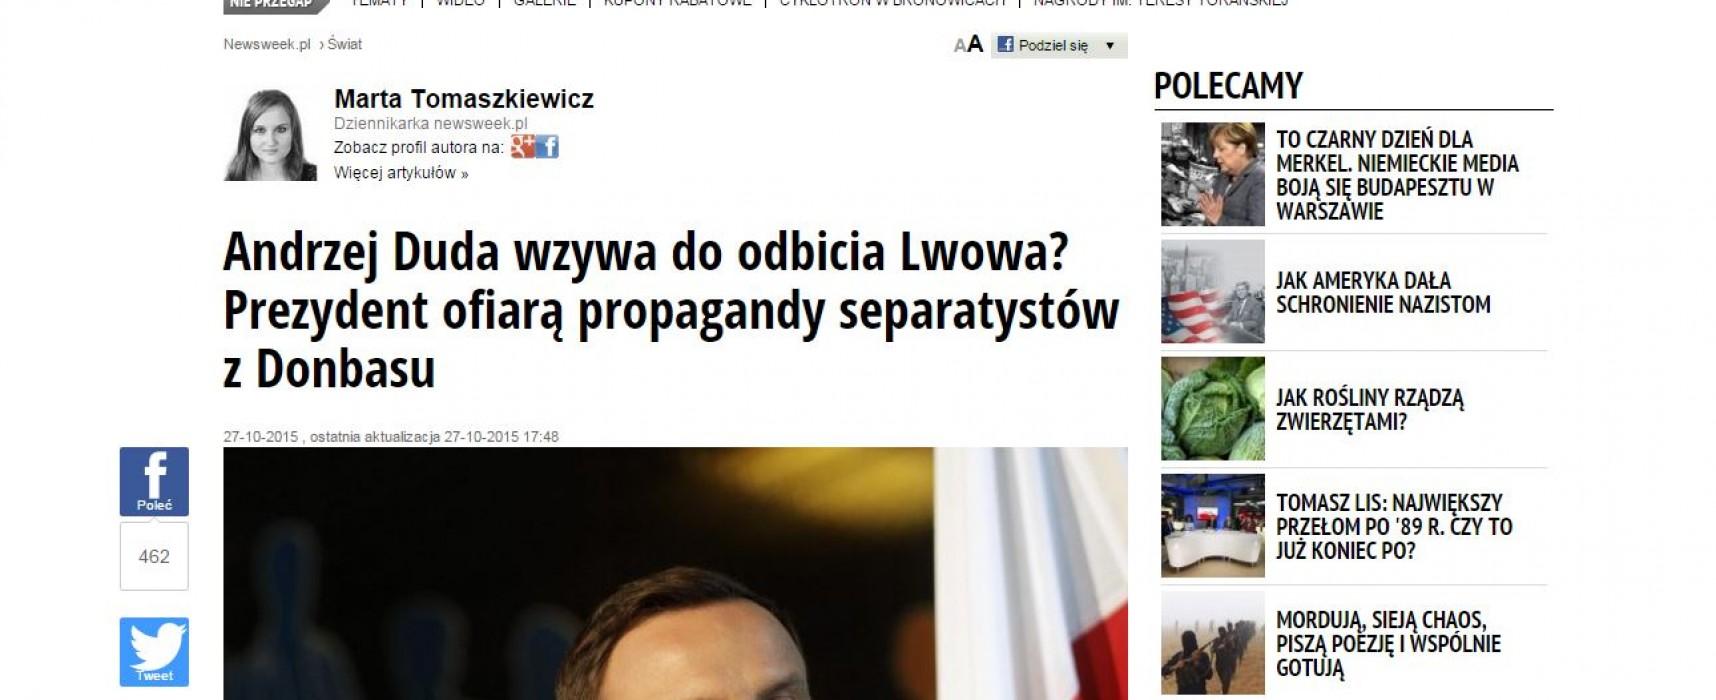 Полско списание по грешка обвини украинско СМИ, че измислило заявление на Анджей Дуда